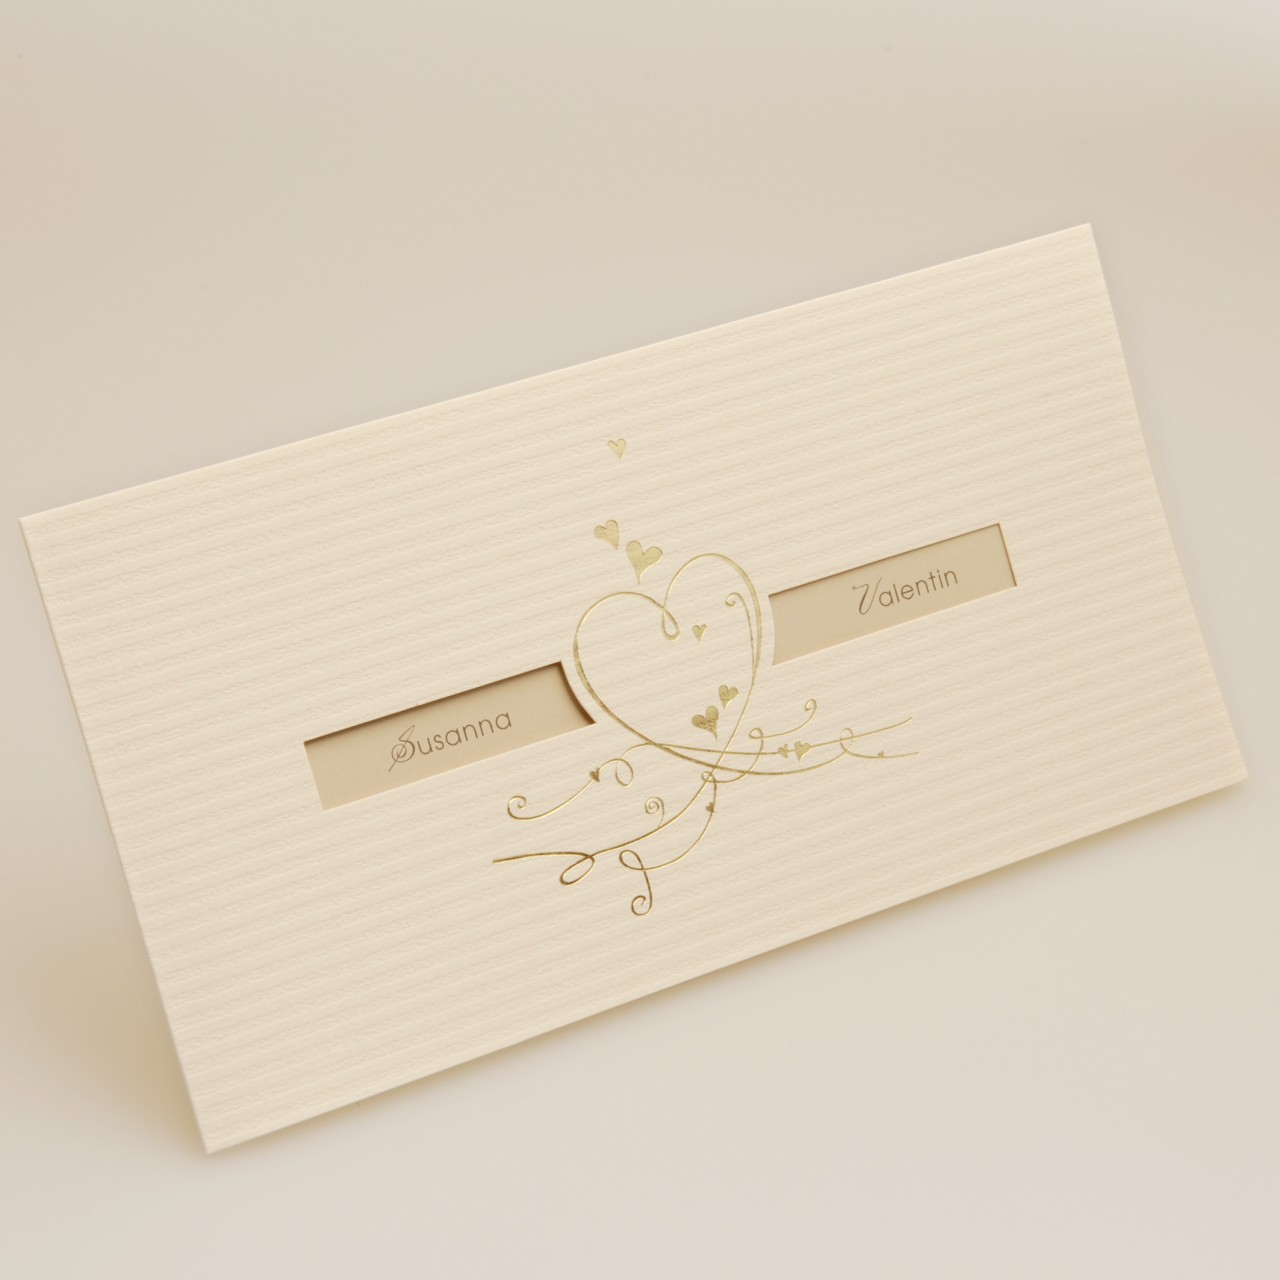 Einladungskarte - H 1860